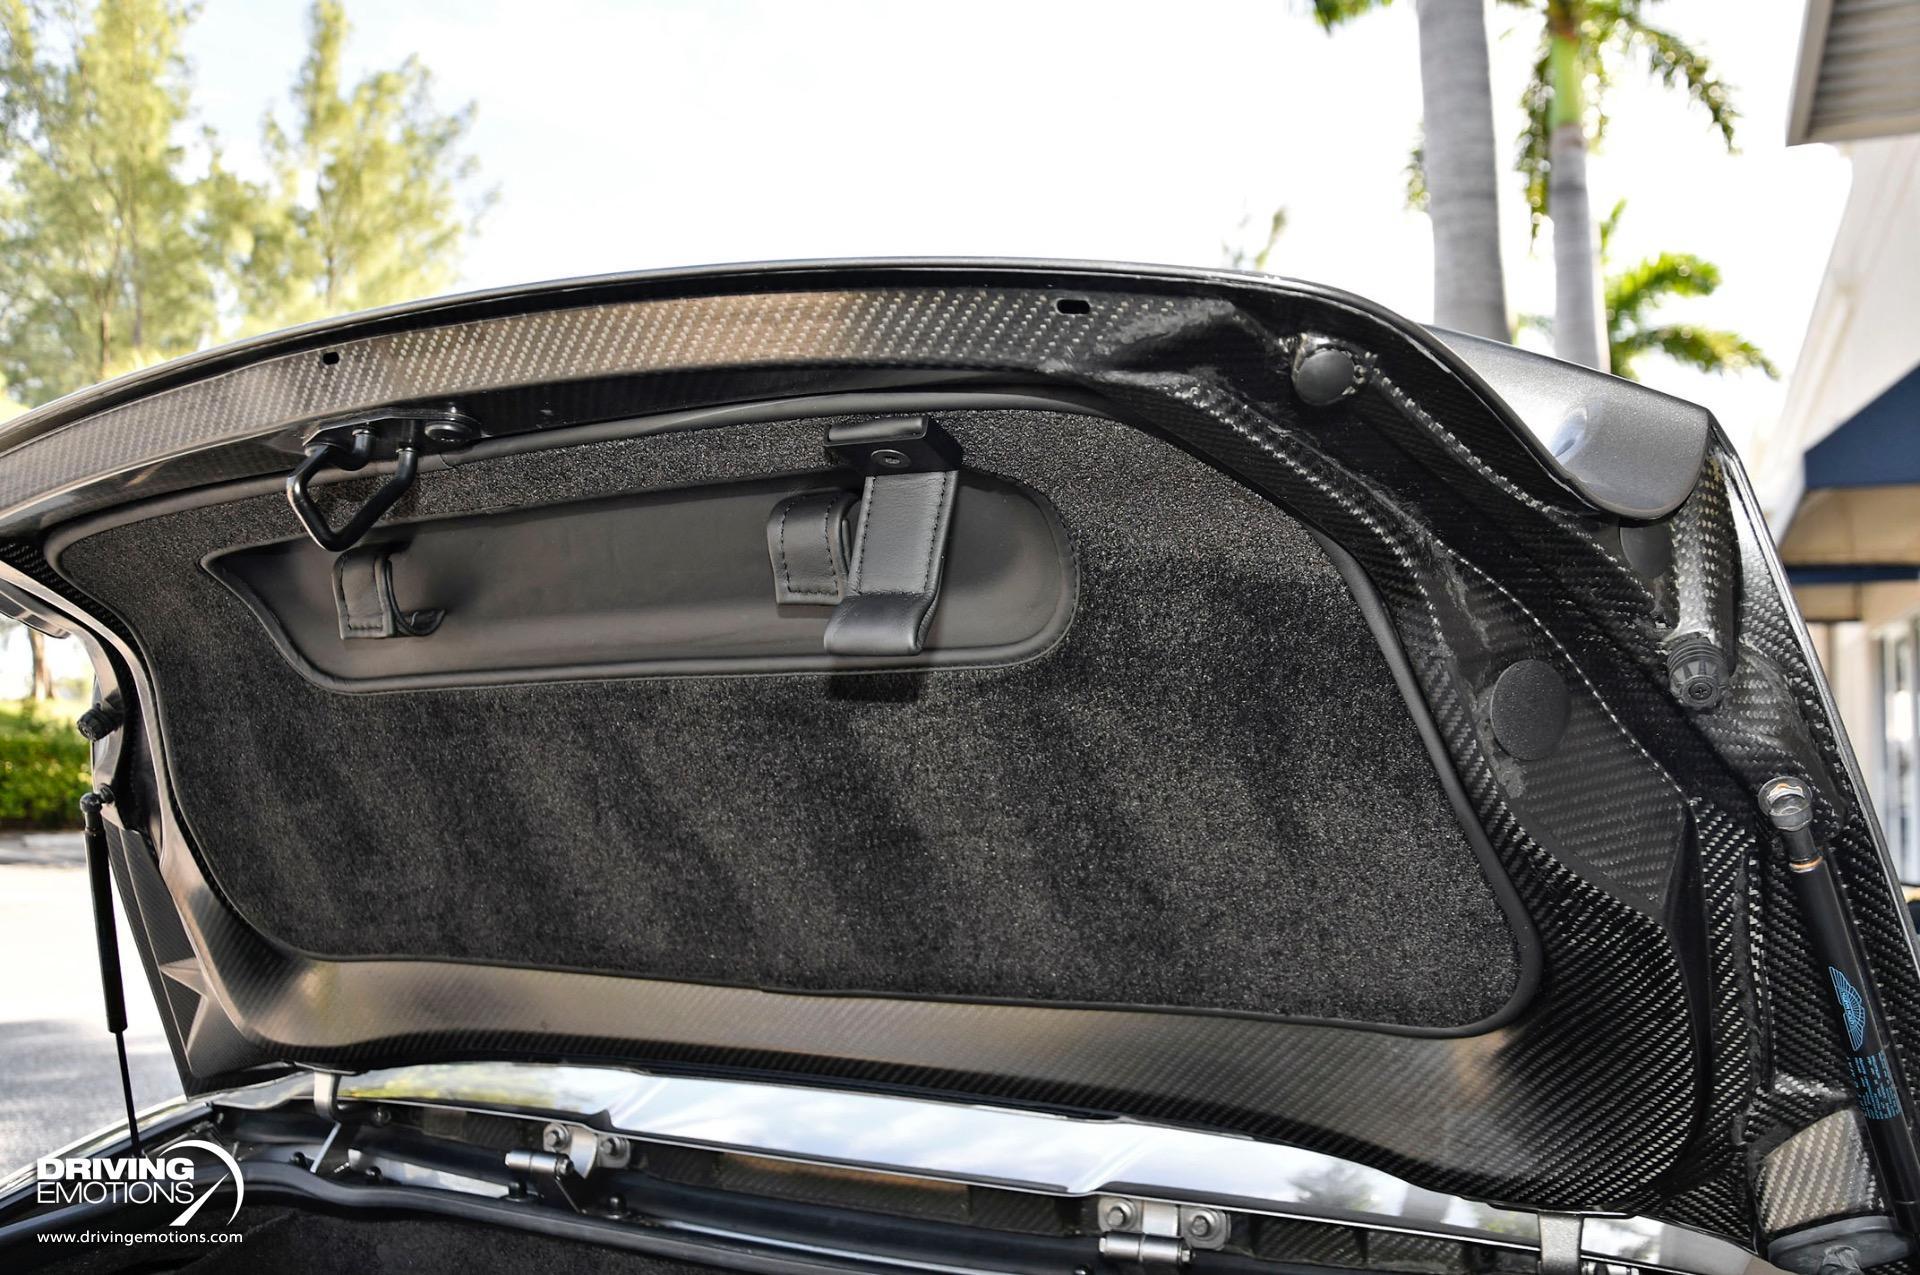 Used 2015 Aston Martin Vanquish Volante $329k MSRP! Volante Convertible! | Lake Park, FL